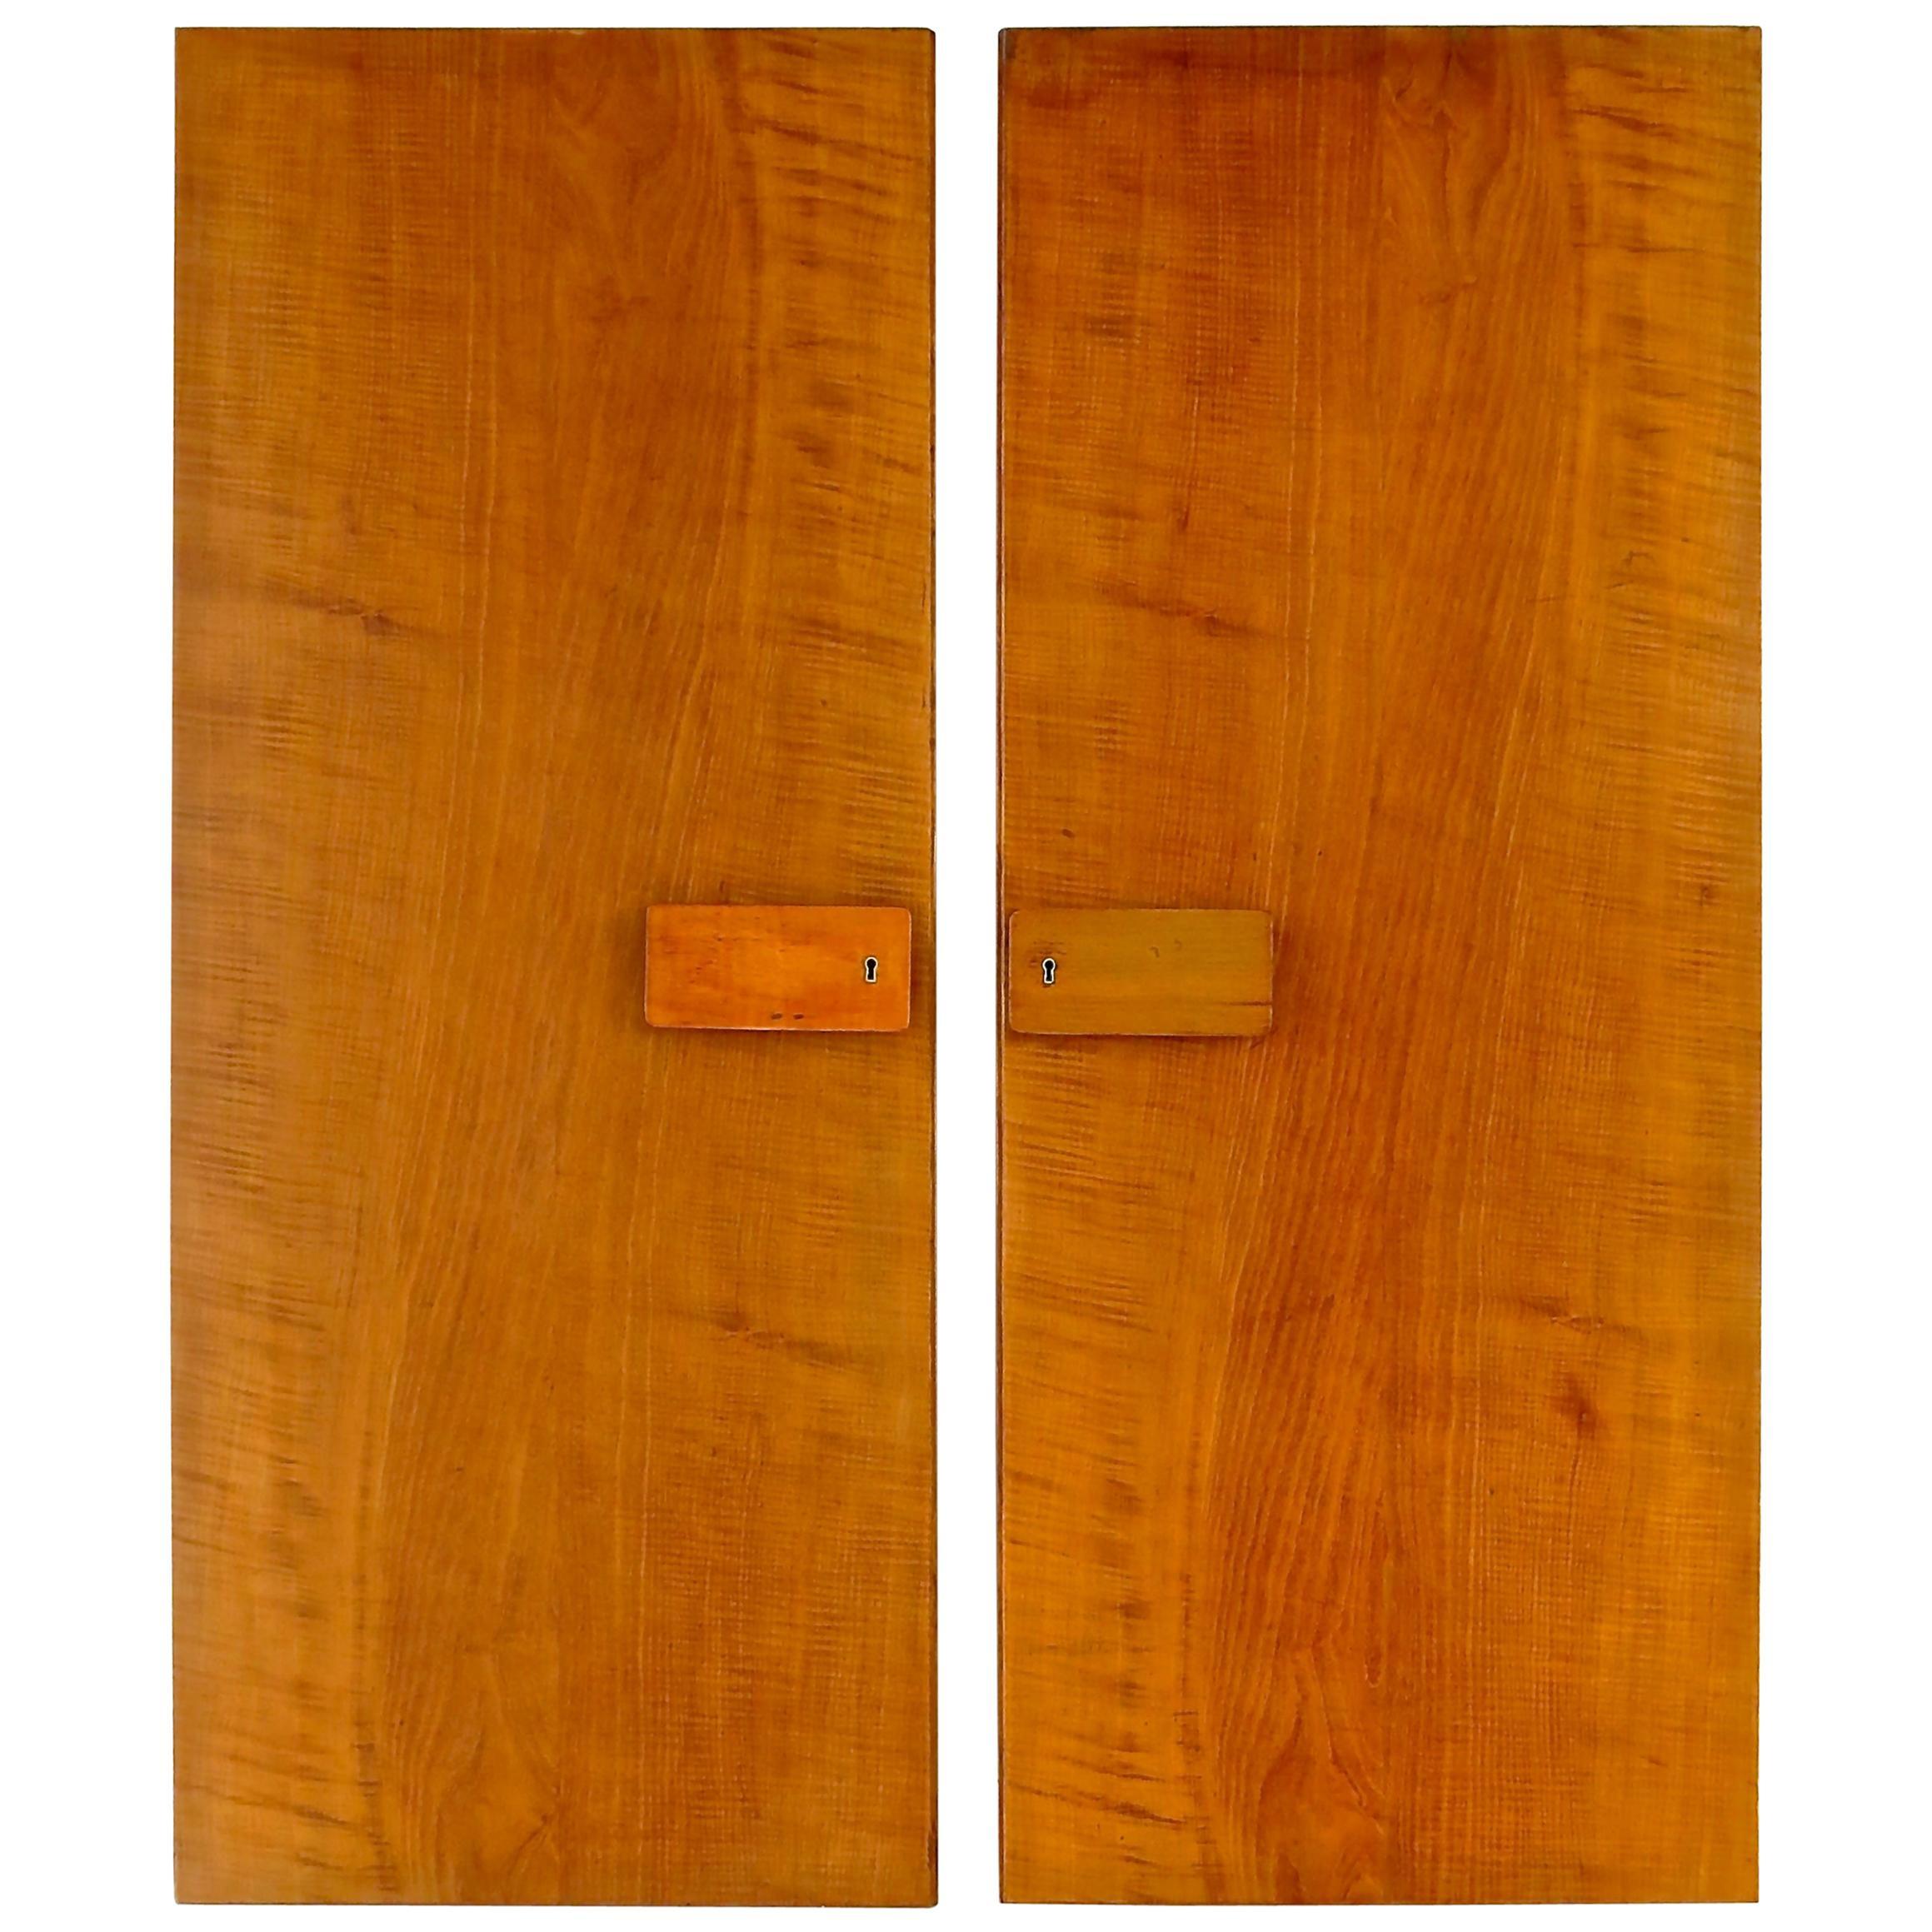 Pair of Gio Ponti Wardrobe Doors from the Hotel Royal, Naples, 1955